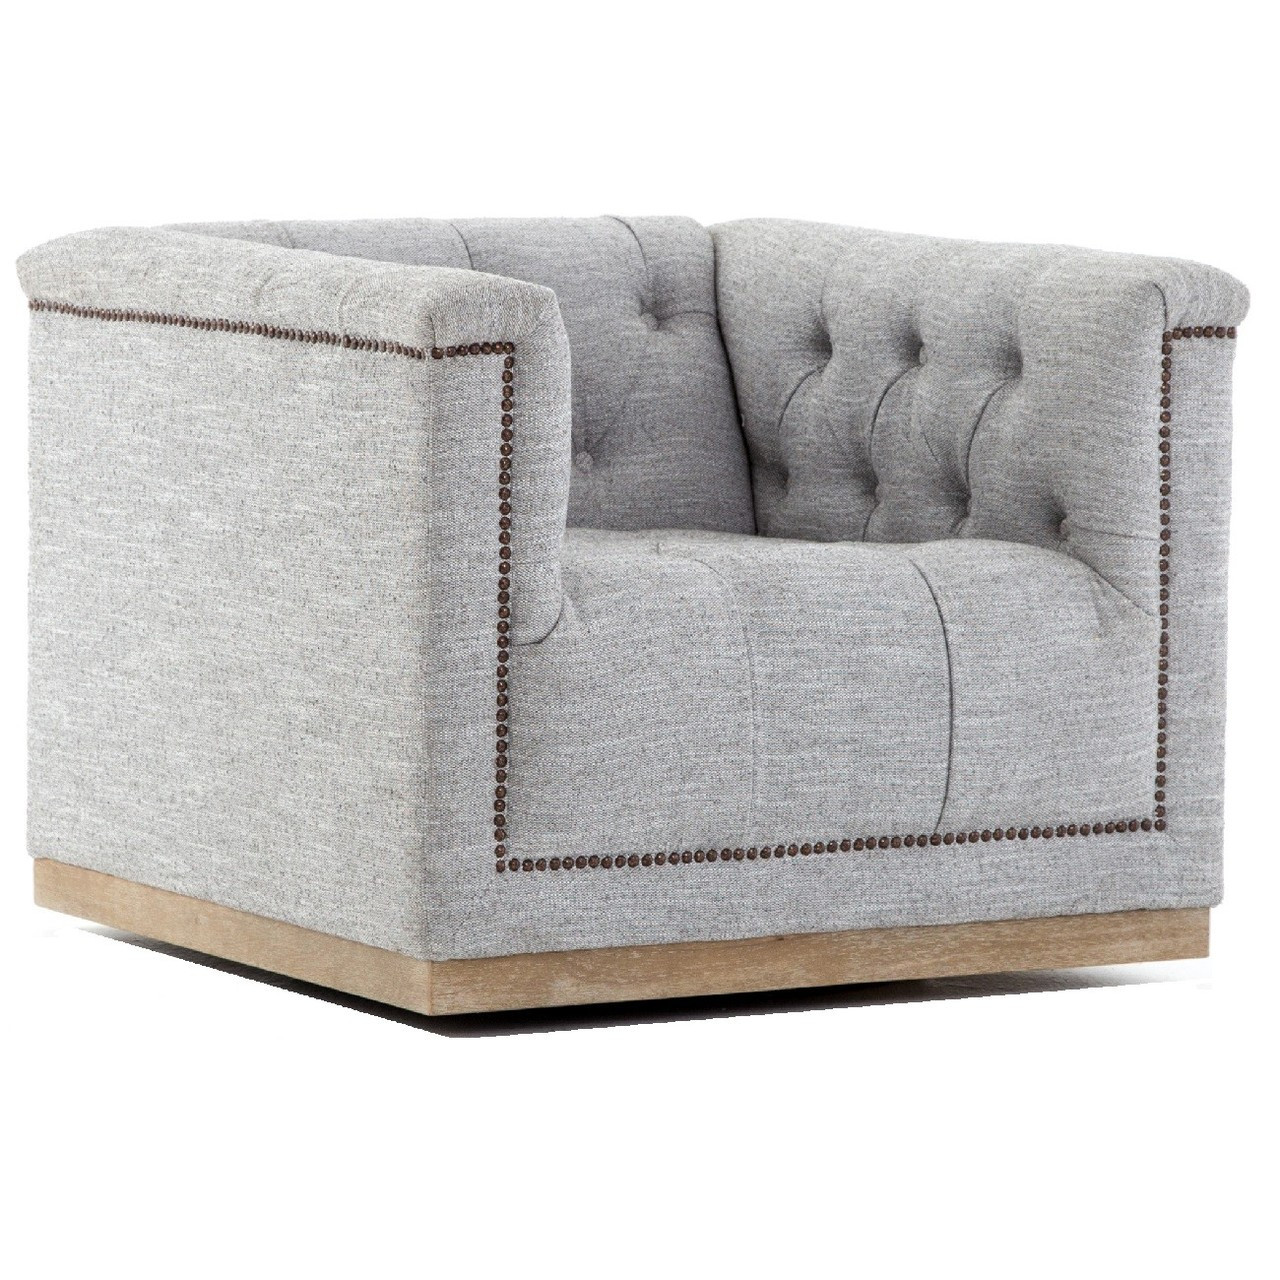 swivel club chair ergonomic reading maxx grey fabric upholstered tufted zin home